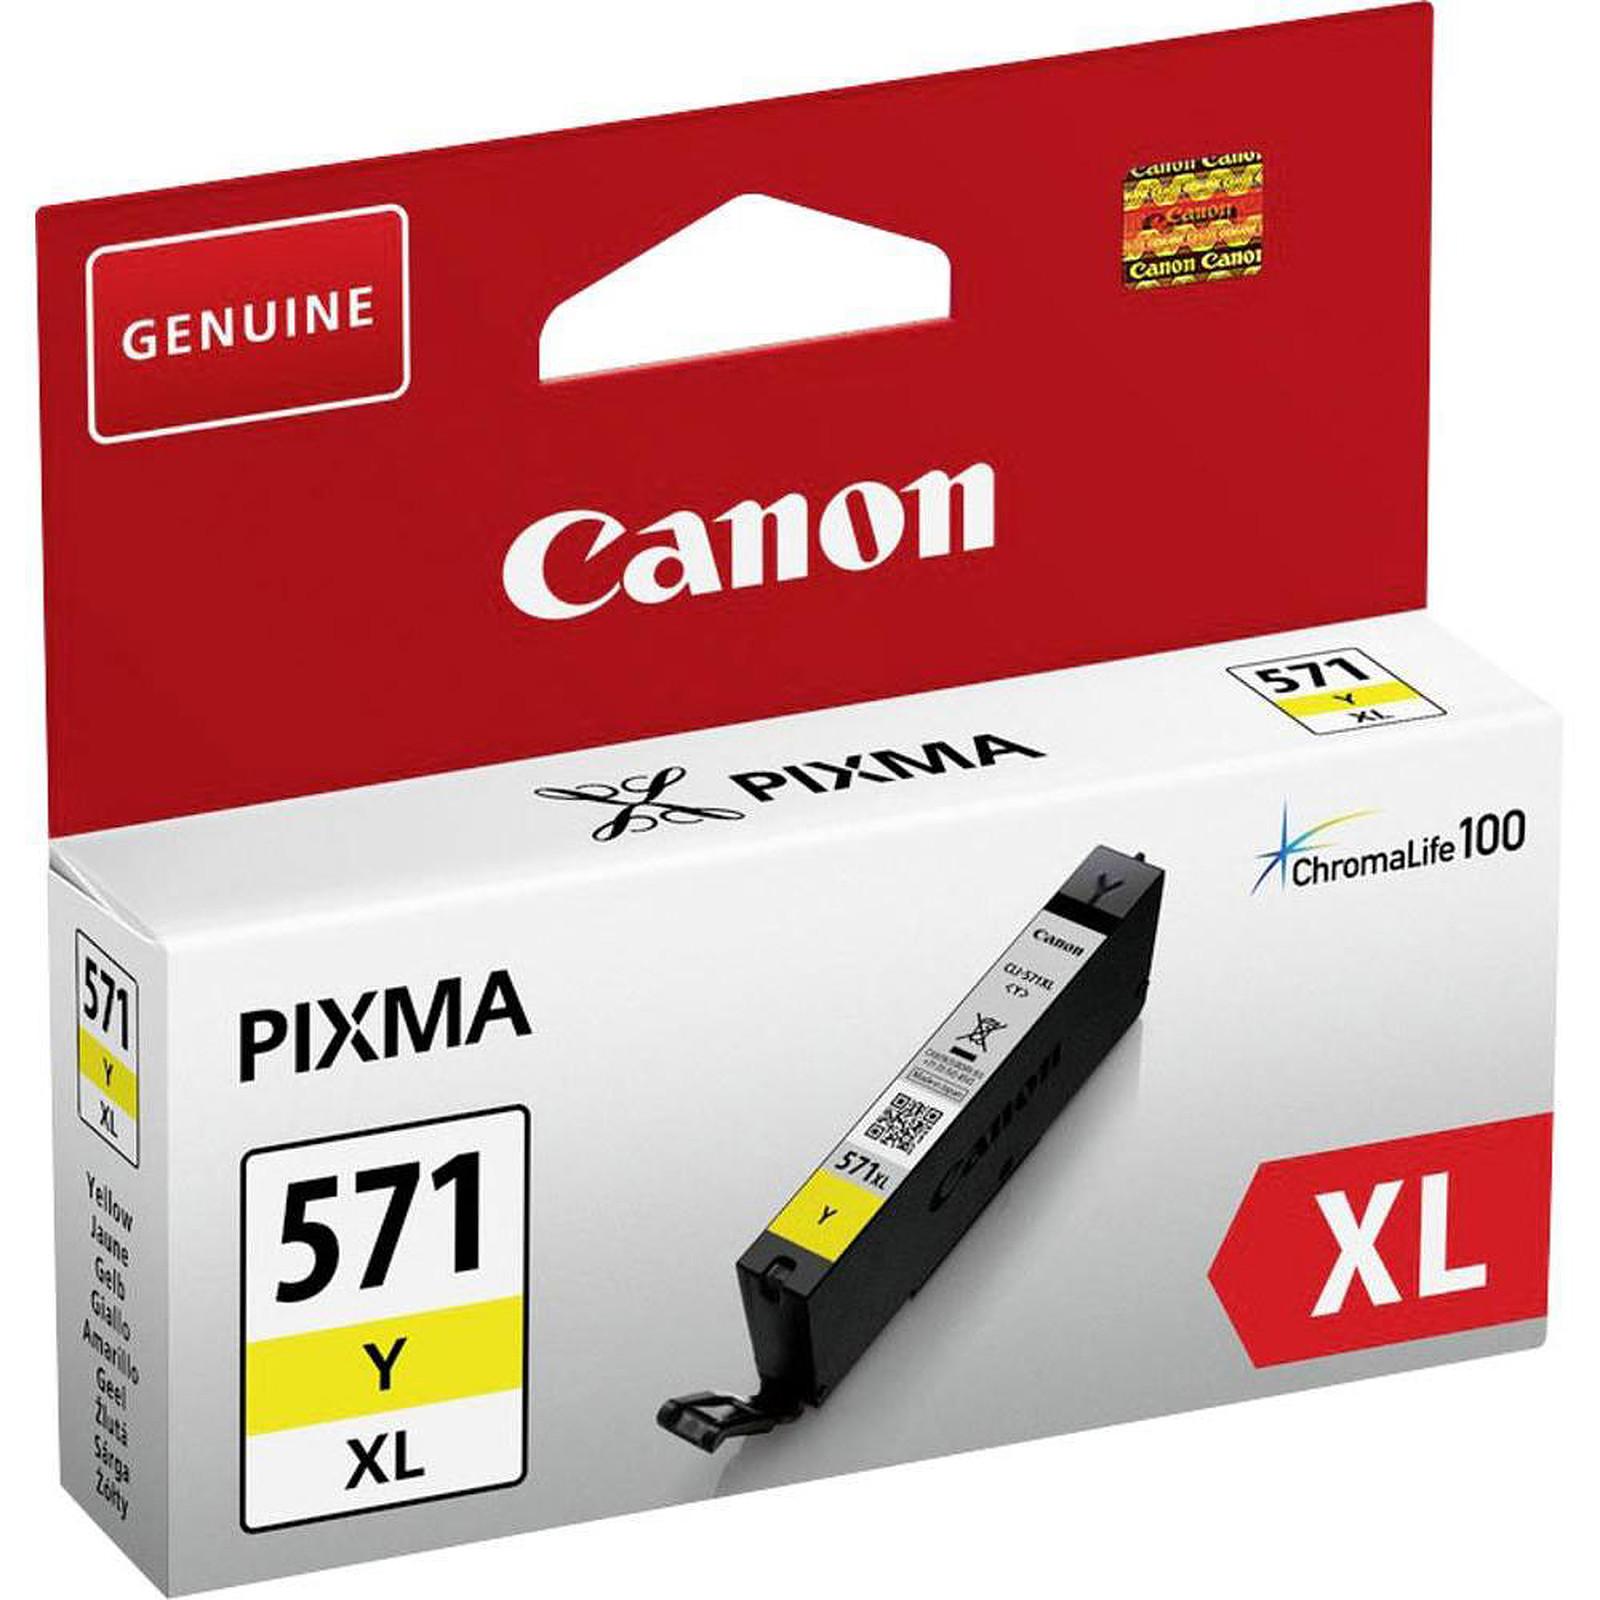 Canon CLI-571Y XL